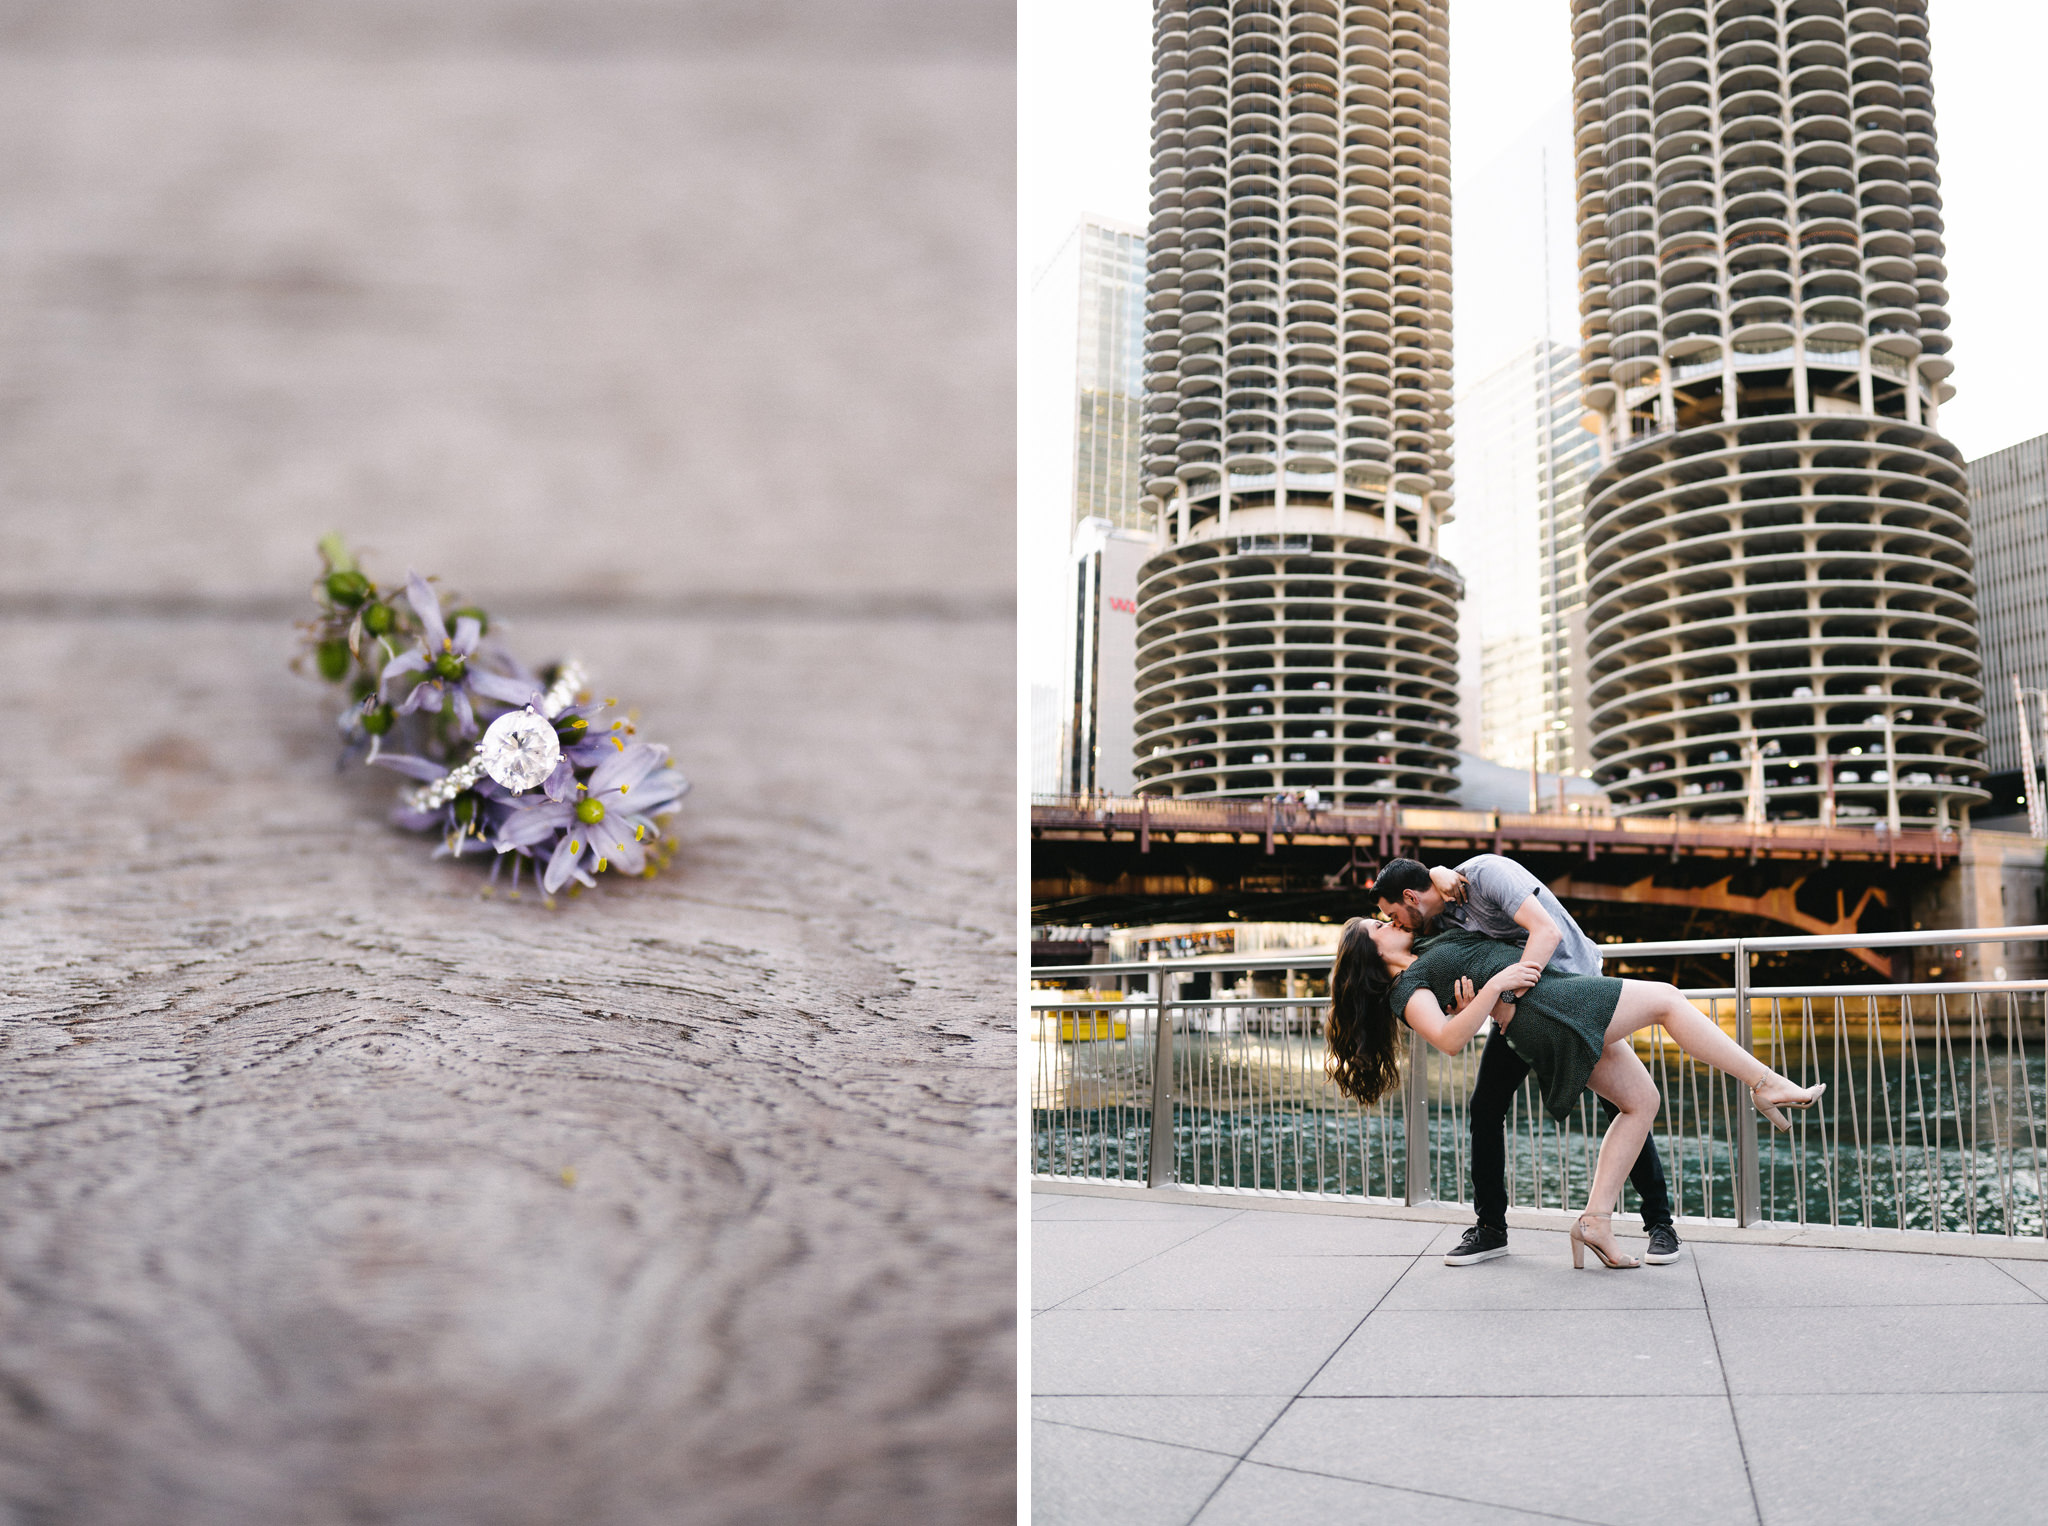 009-rempel-photography-chicago-wedding-inspiration-matt-mariana-riverwalk-engagement-session-city-view-loft-ohana-events.jpg